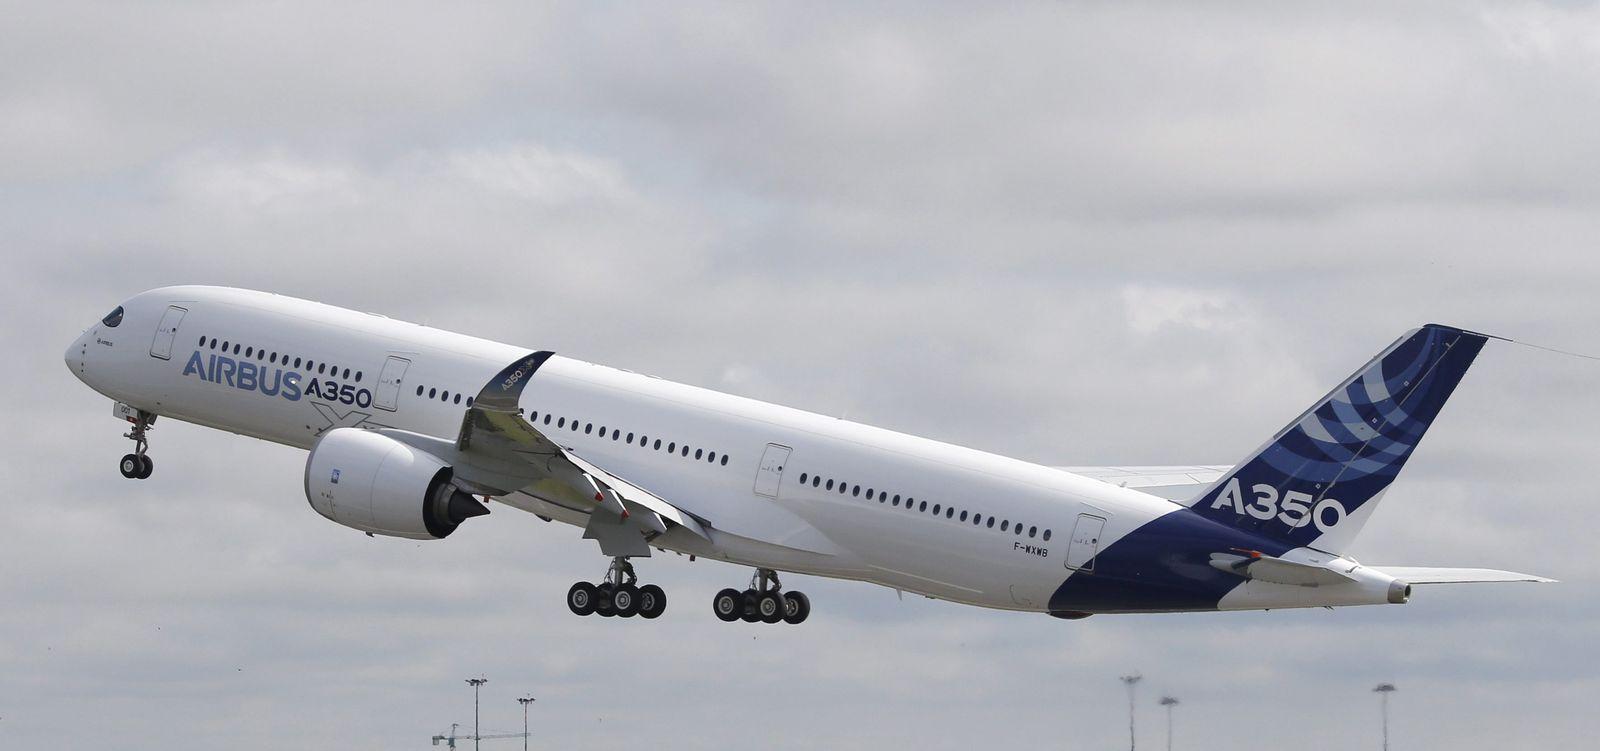 Airbus A350 XWB / Jungfernflug